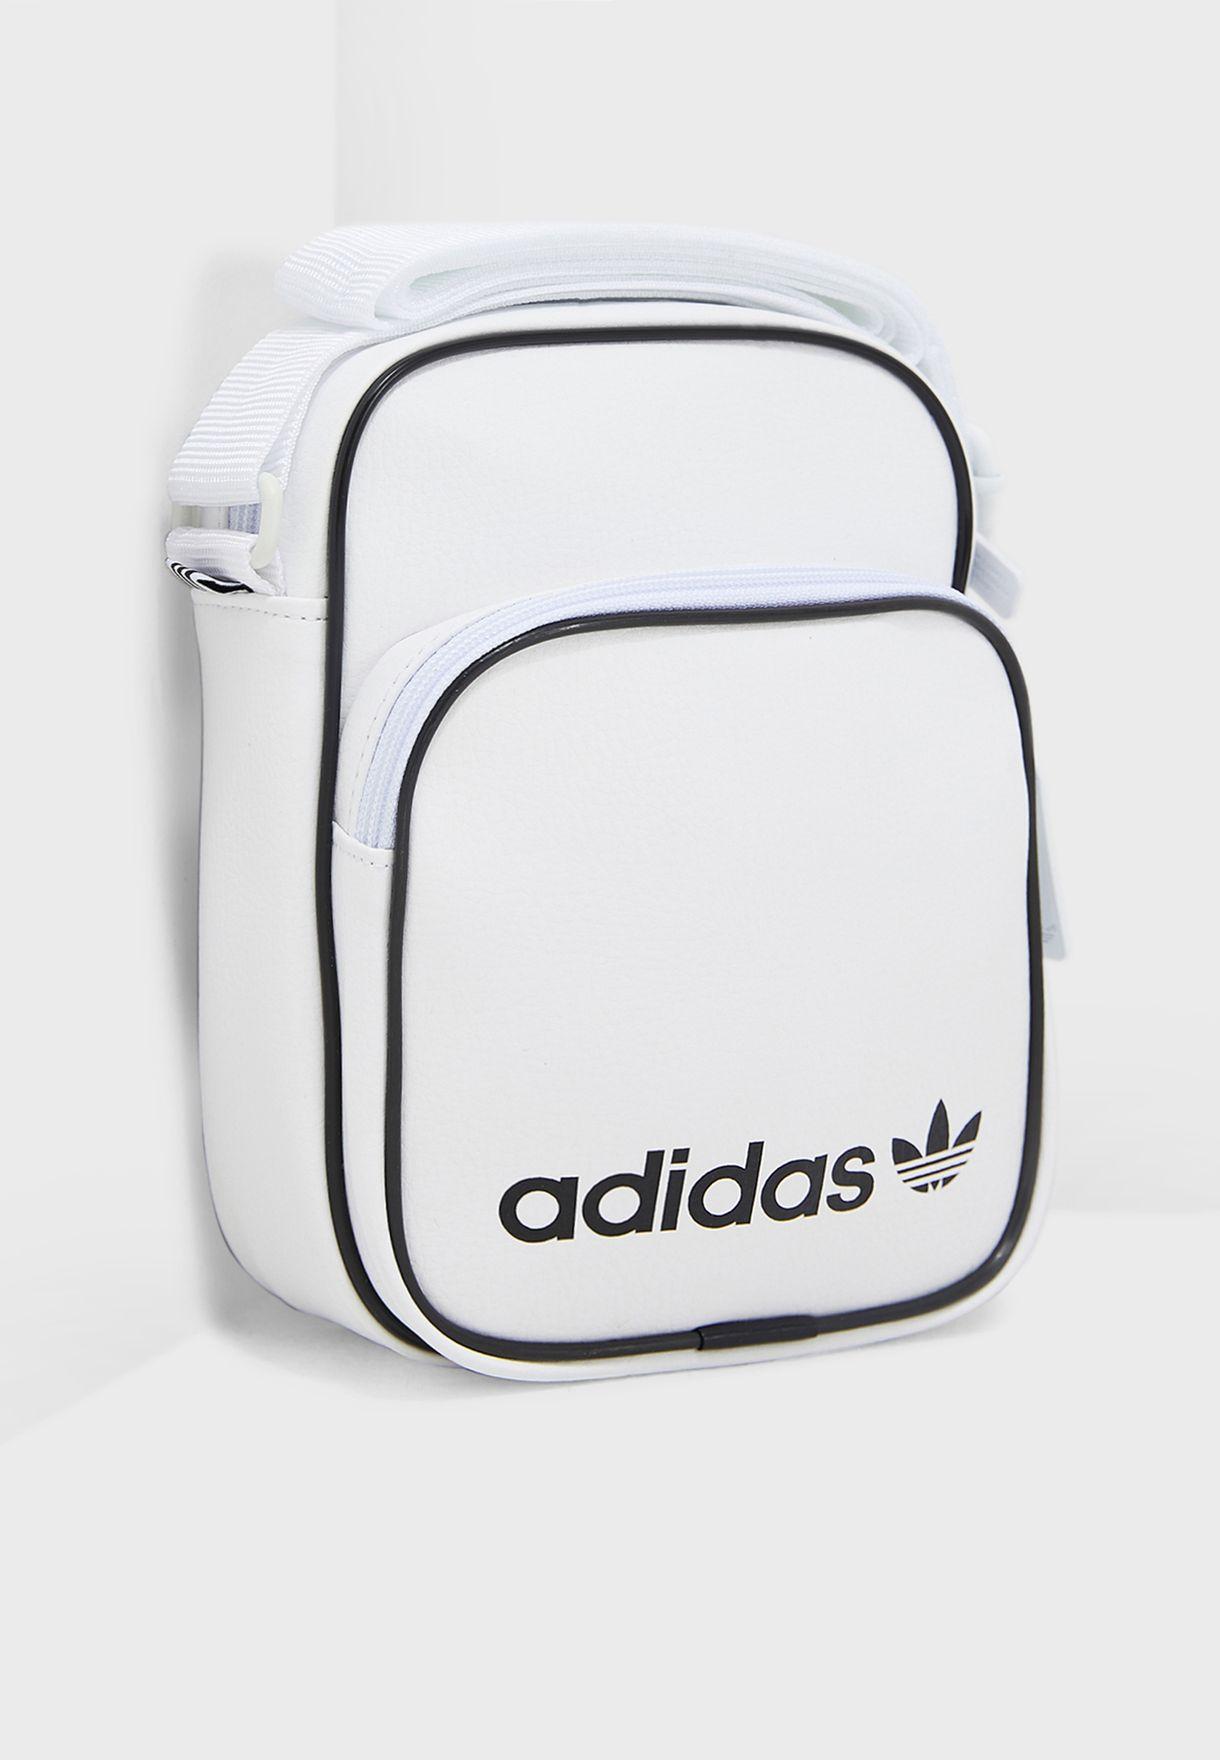 189c2a5f54fb Shop adidas Originals white Mini Vintage Messenger DV2491 for Women ...